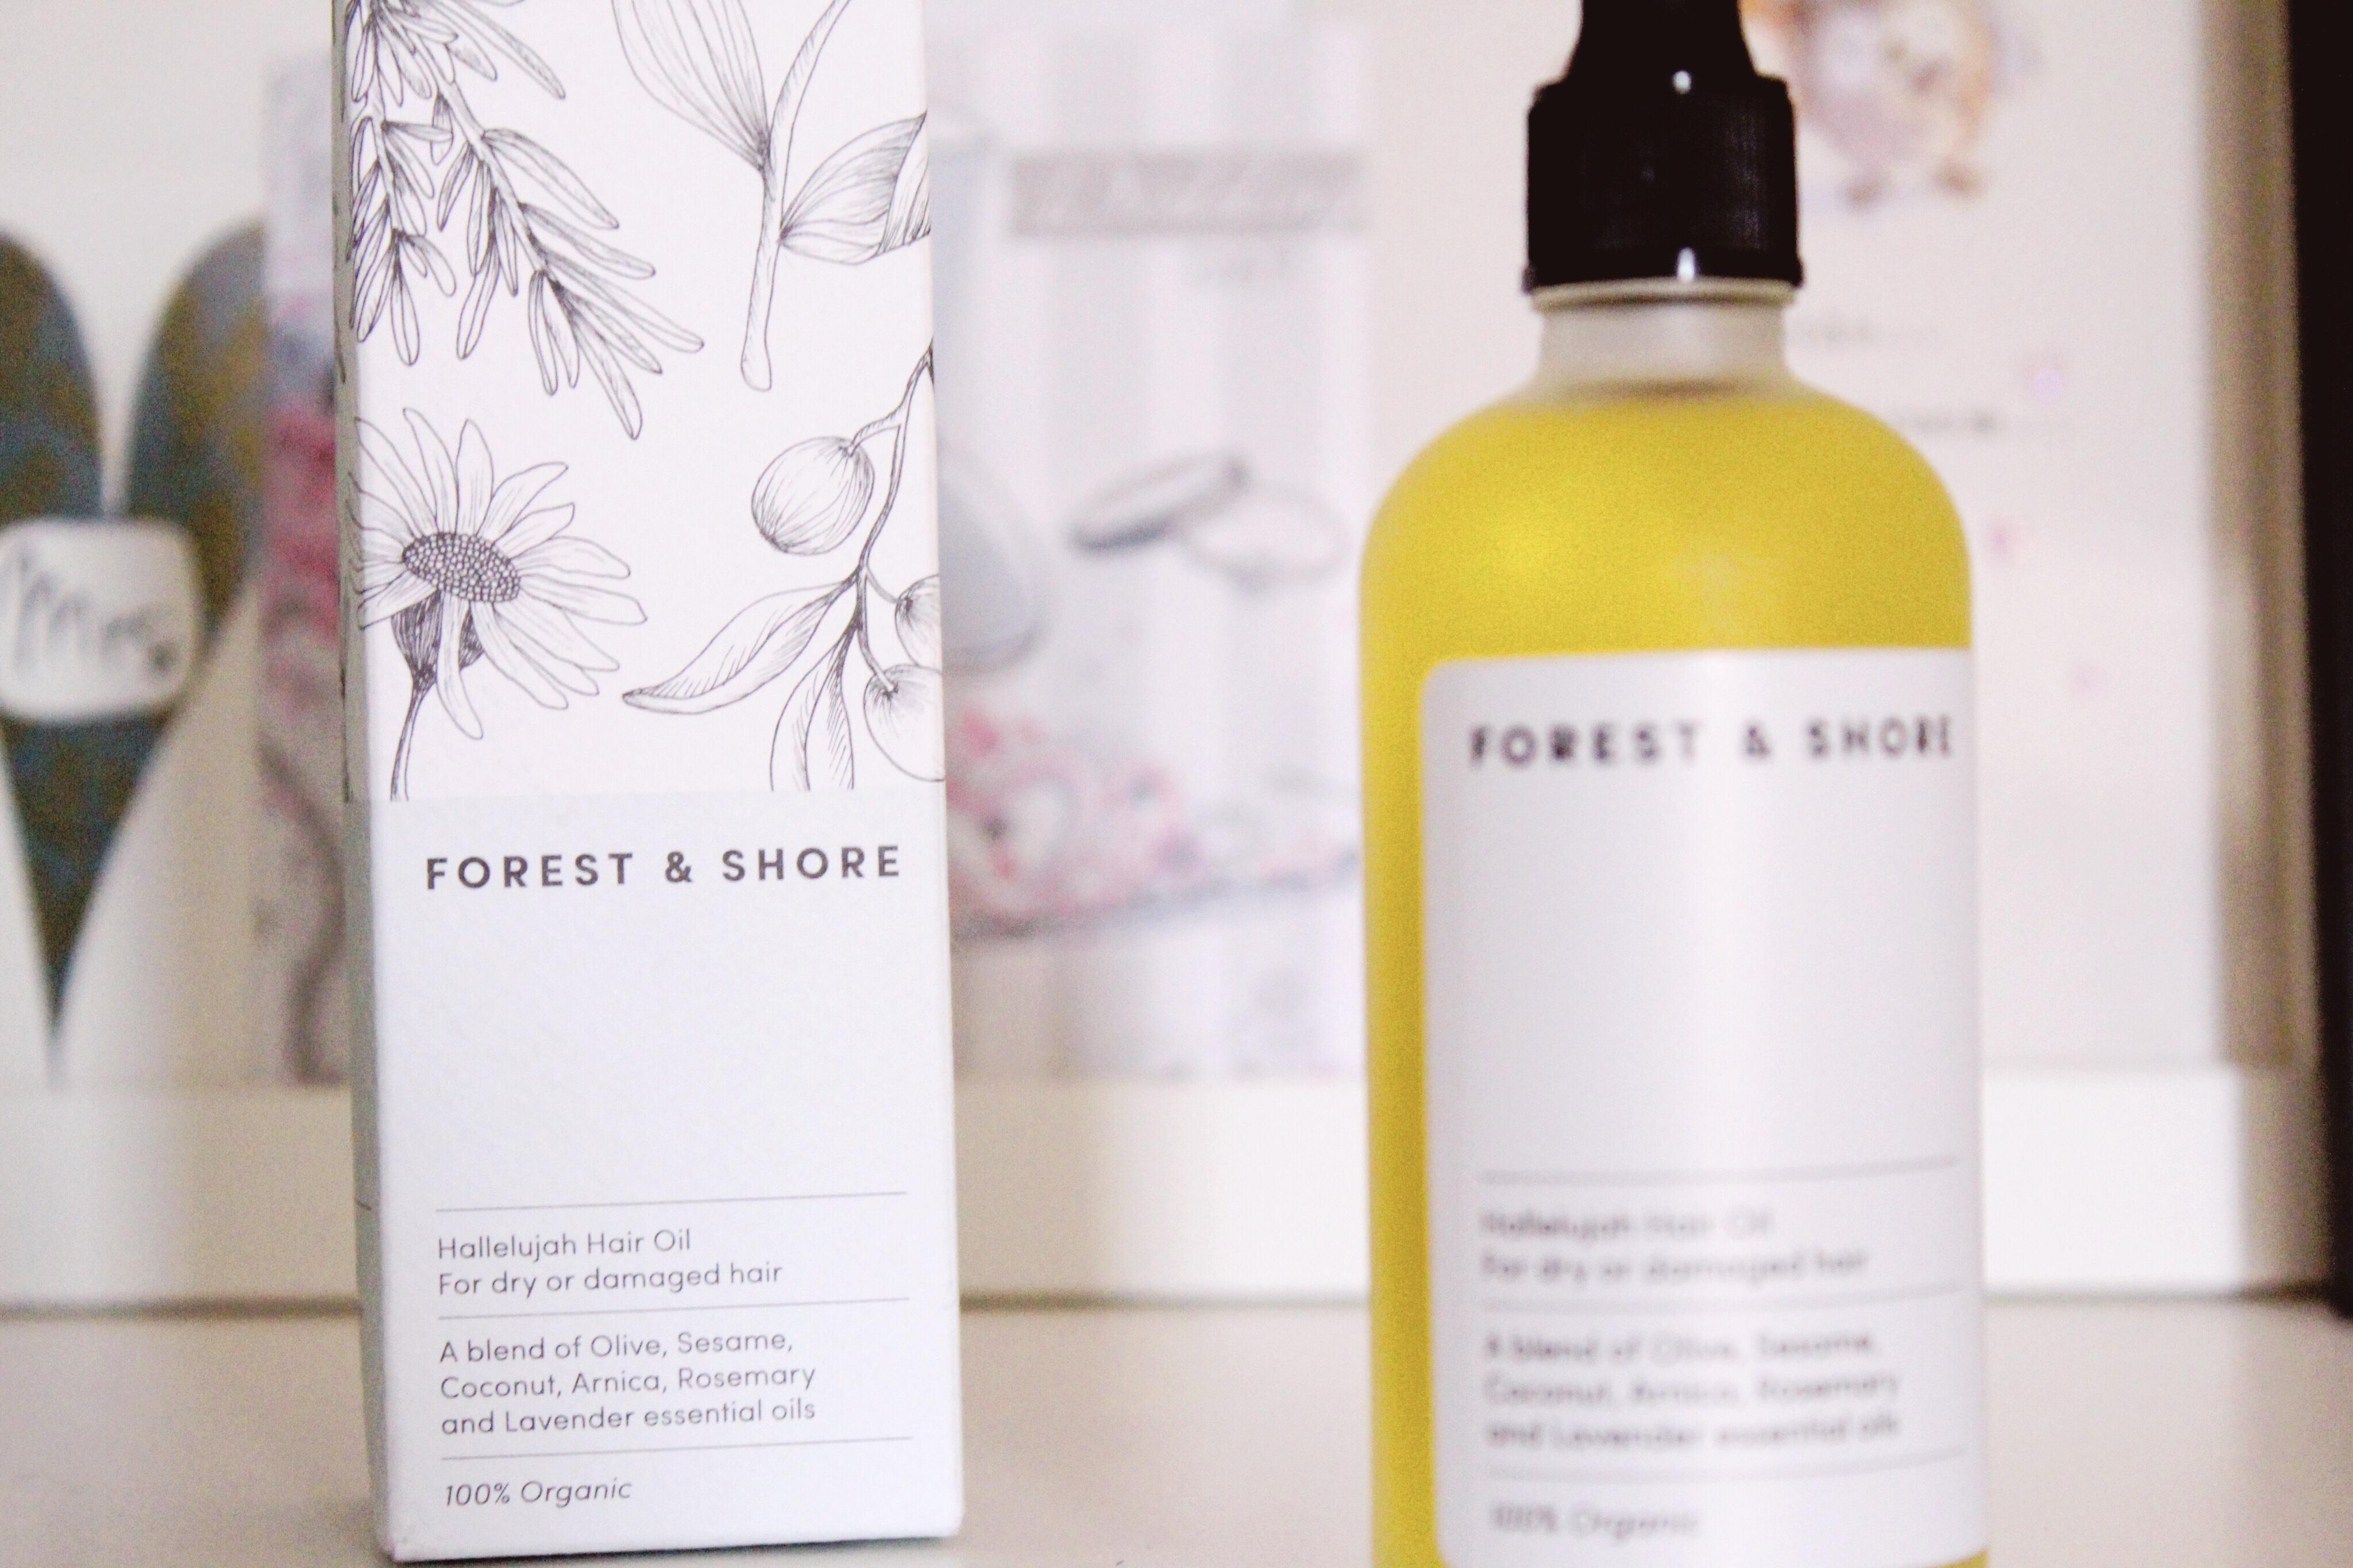 Forest & Shore - Hallelujah Hair Oil